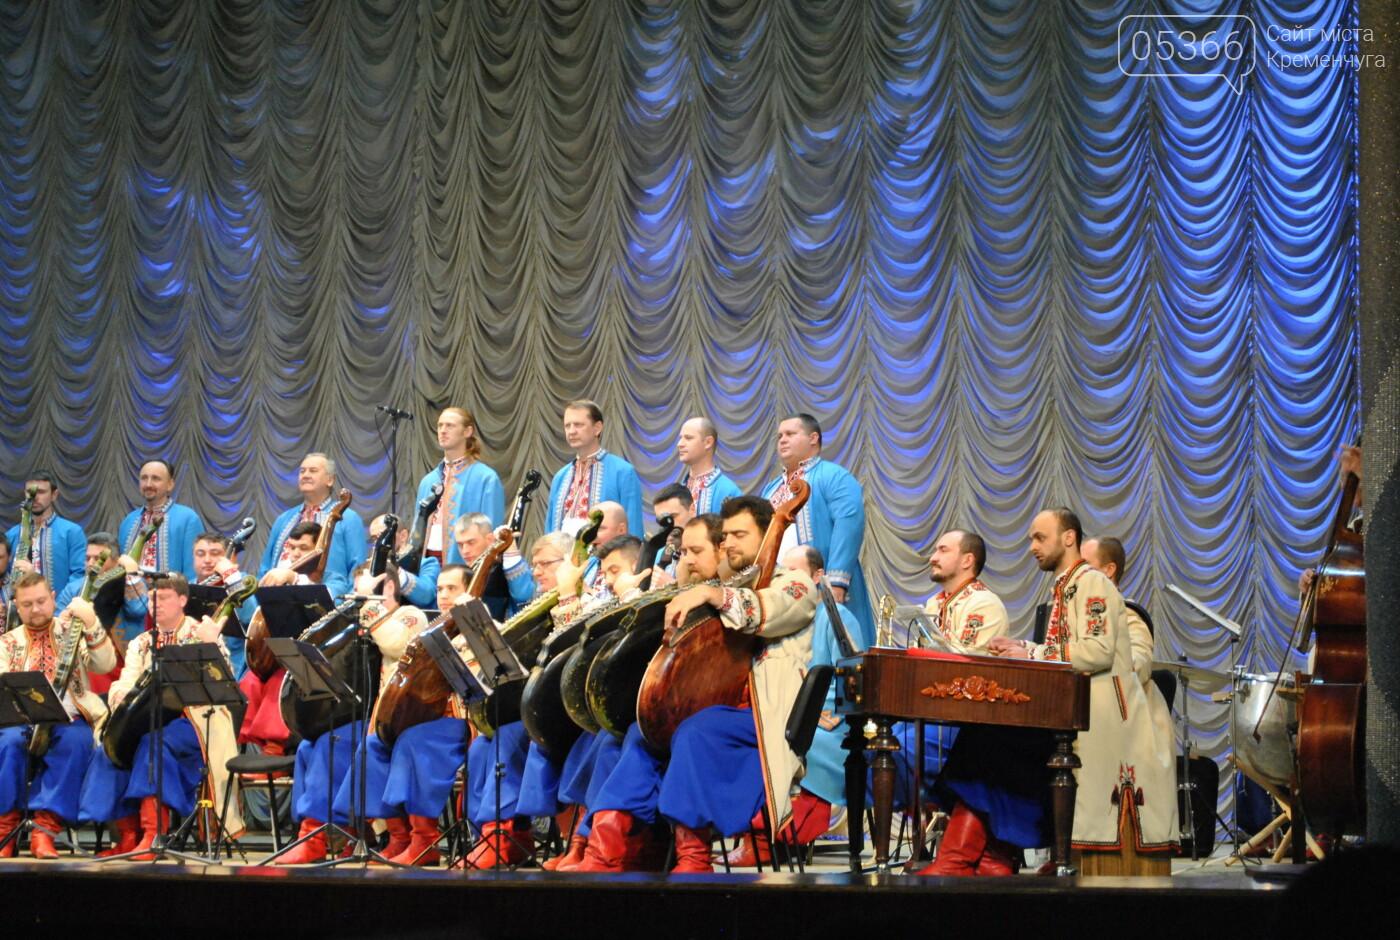 Бандуристи покорили кременчужан своїми виступами та музикою. Фото, фото-2